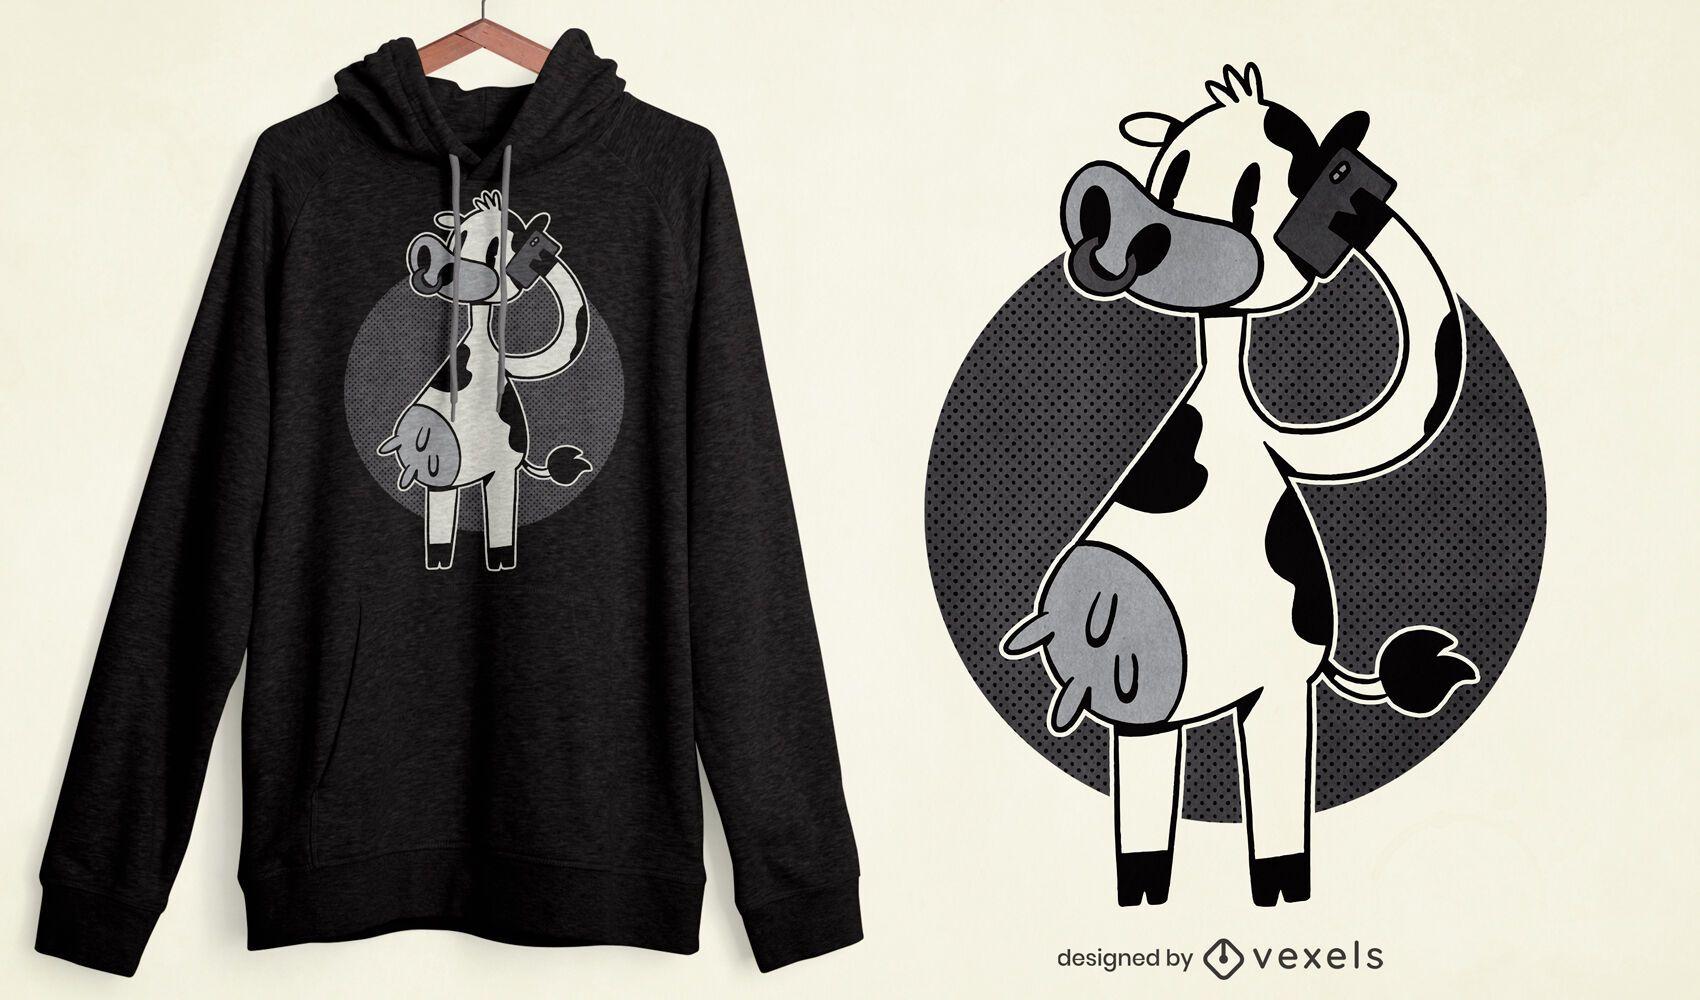 Kuh-Telefonanruf-T-Shirt-Design